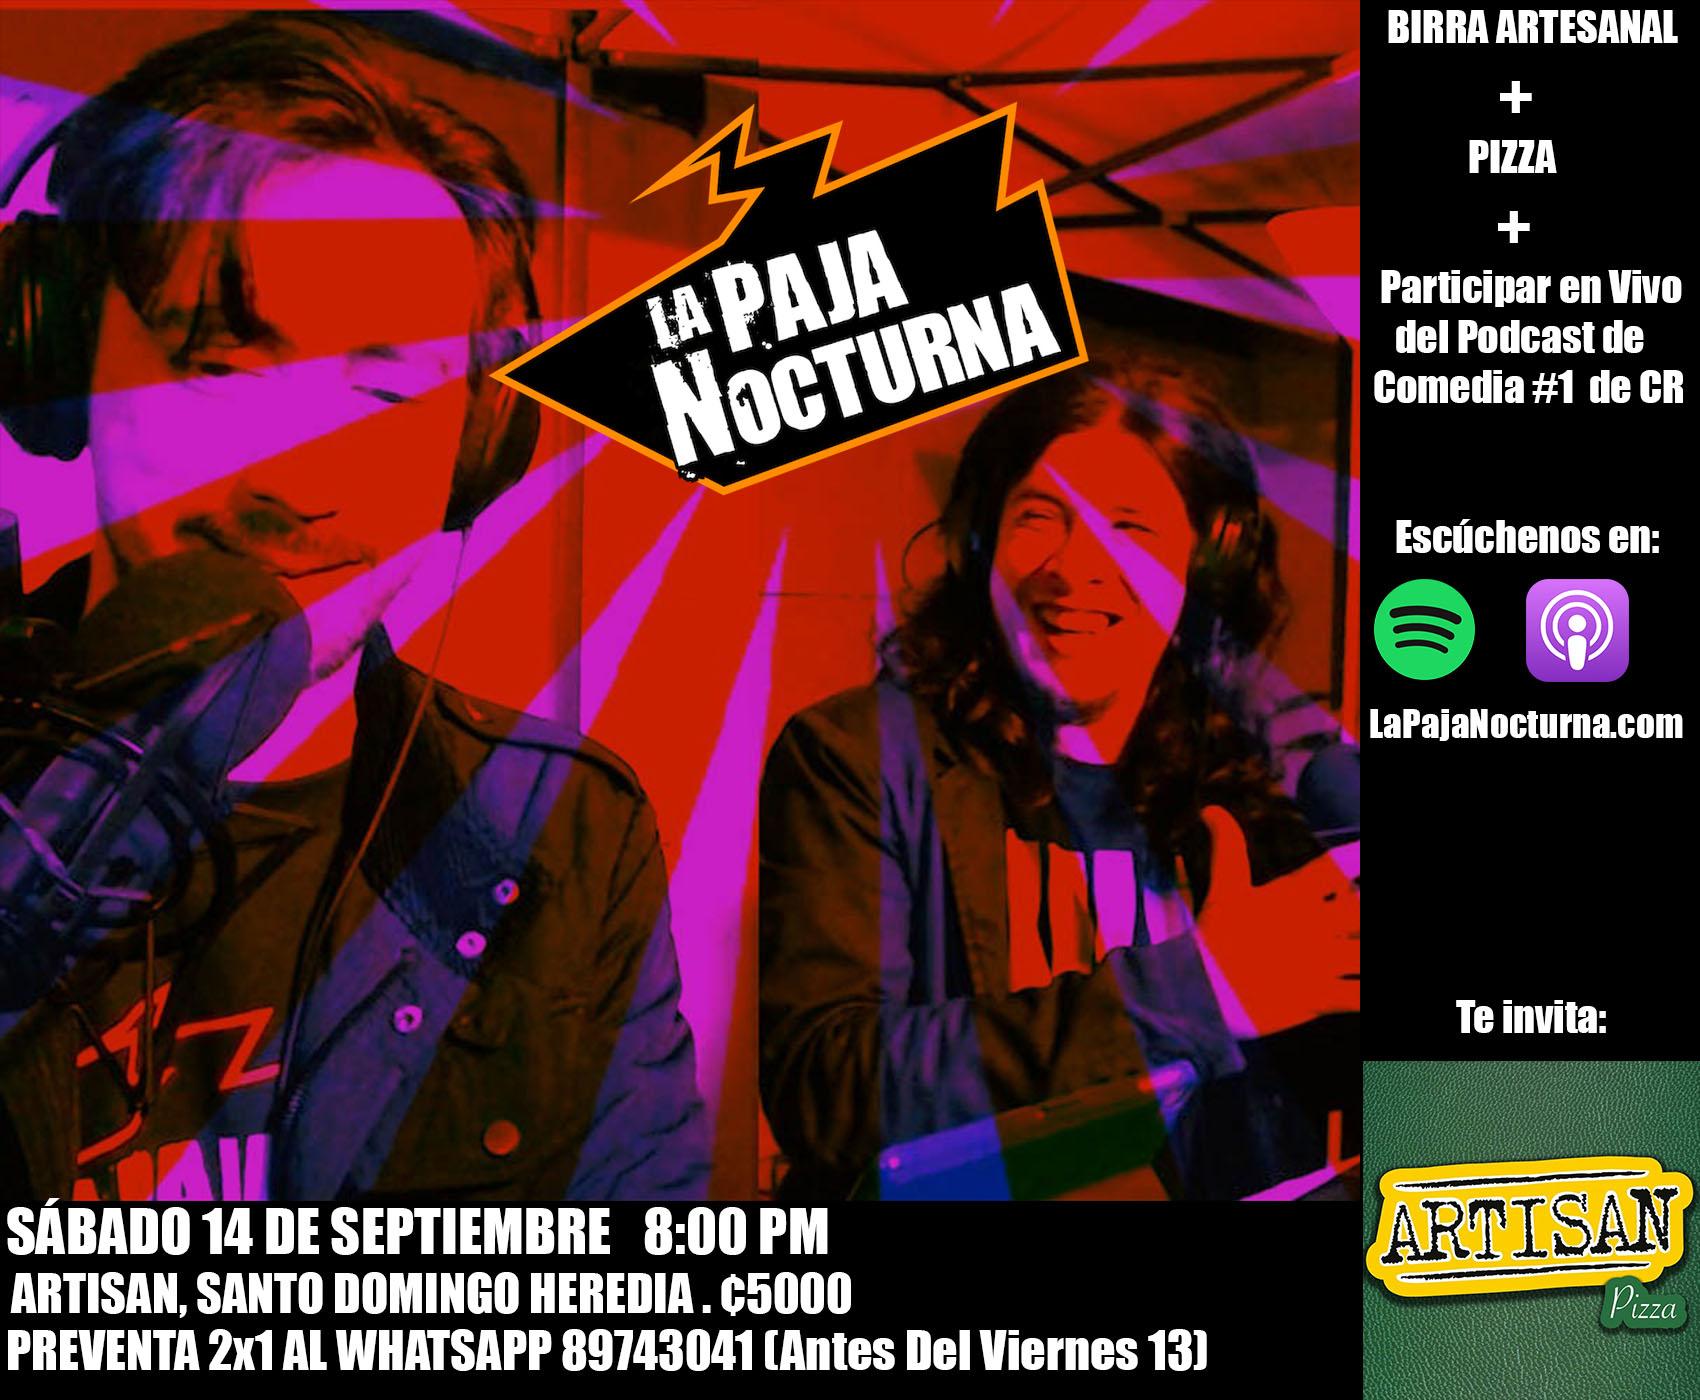 La Paja Nocturna Podcast en Vivo Artisan